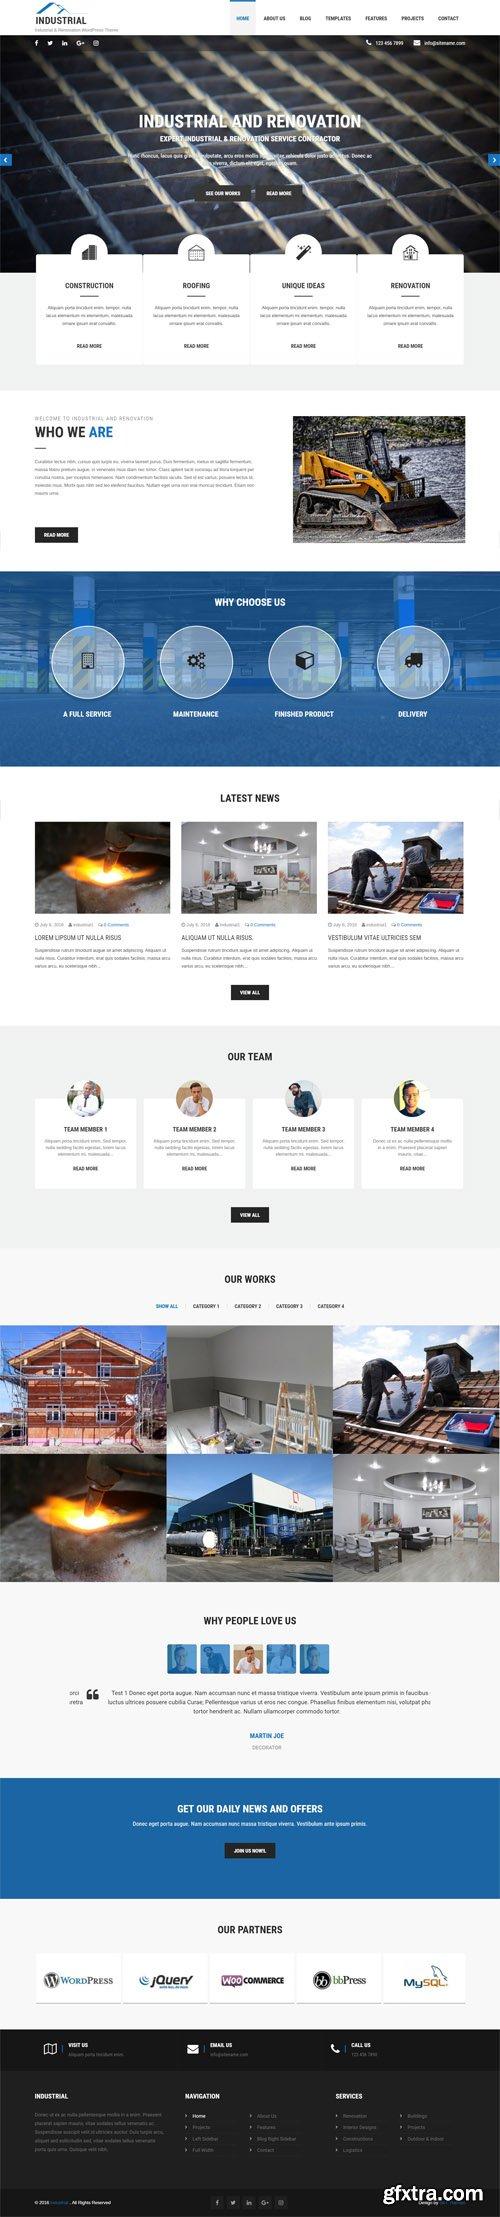 SKT Themes - Industrial v1.0 - Responsive WordPress Theme